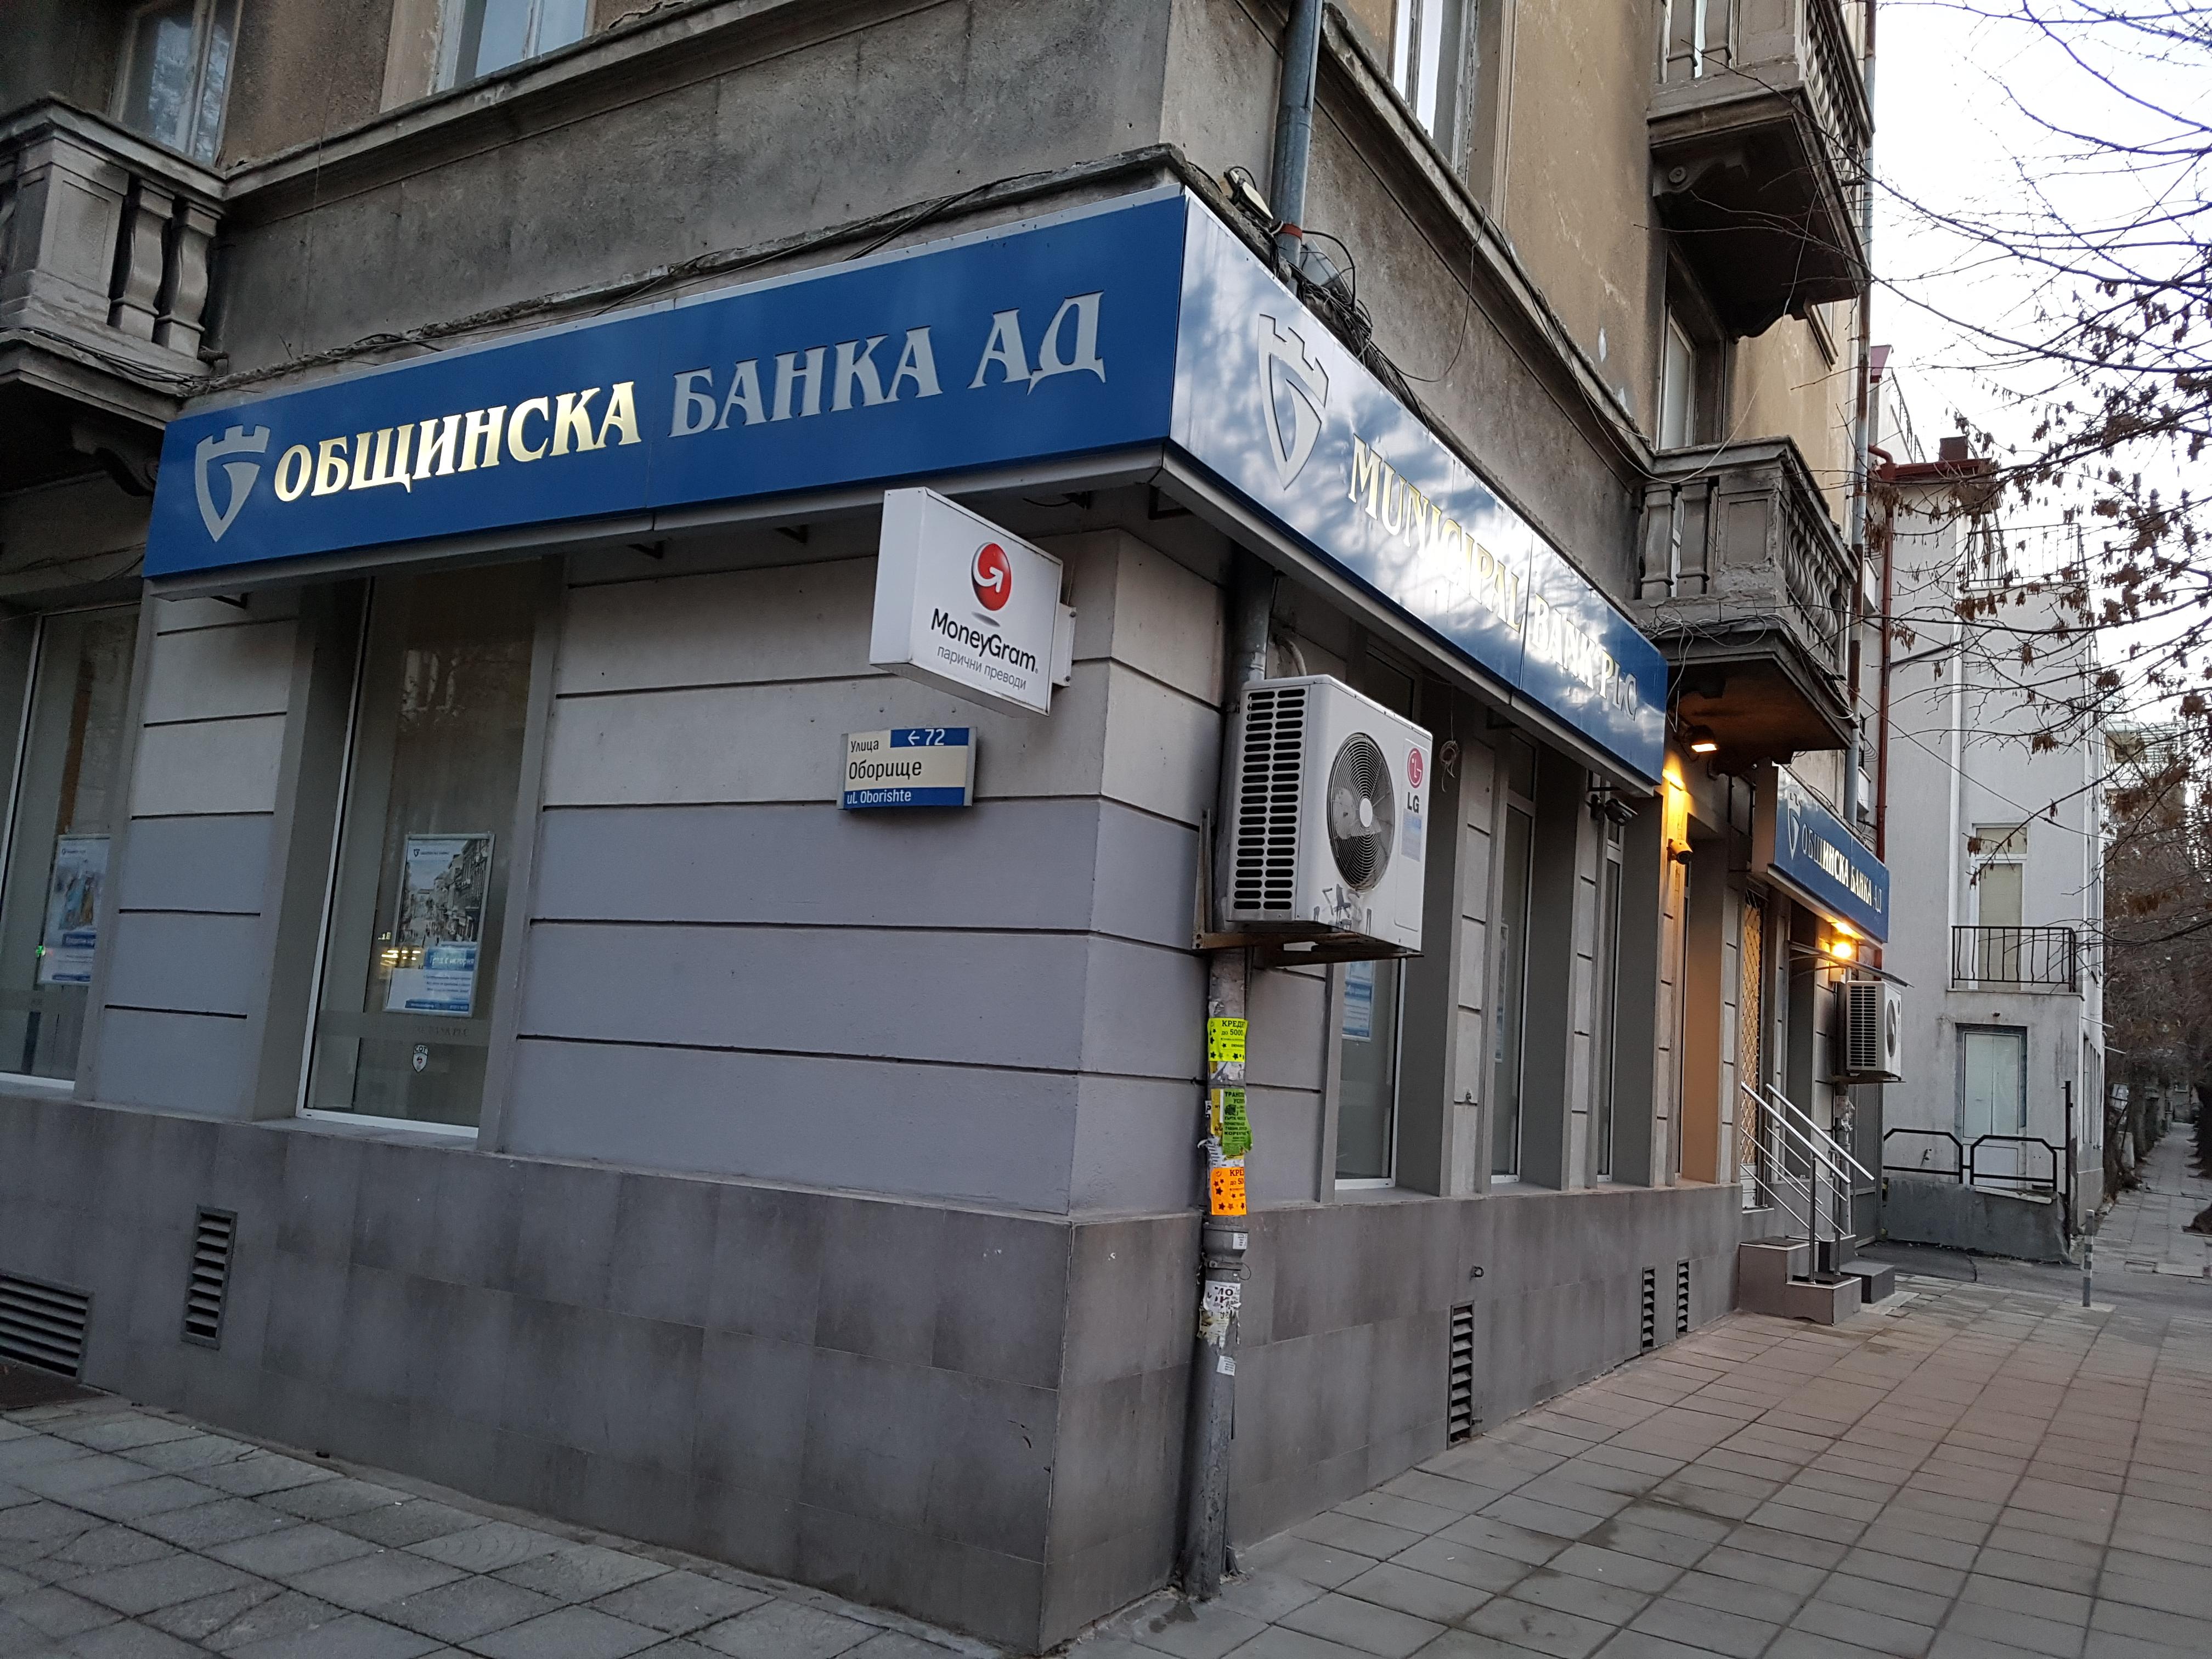 Novito Opportunities gets Bulgarian c-bank nod to acquire Municipal Bank